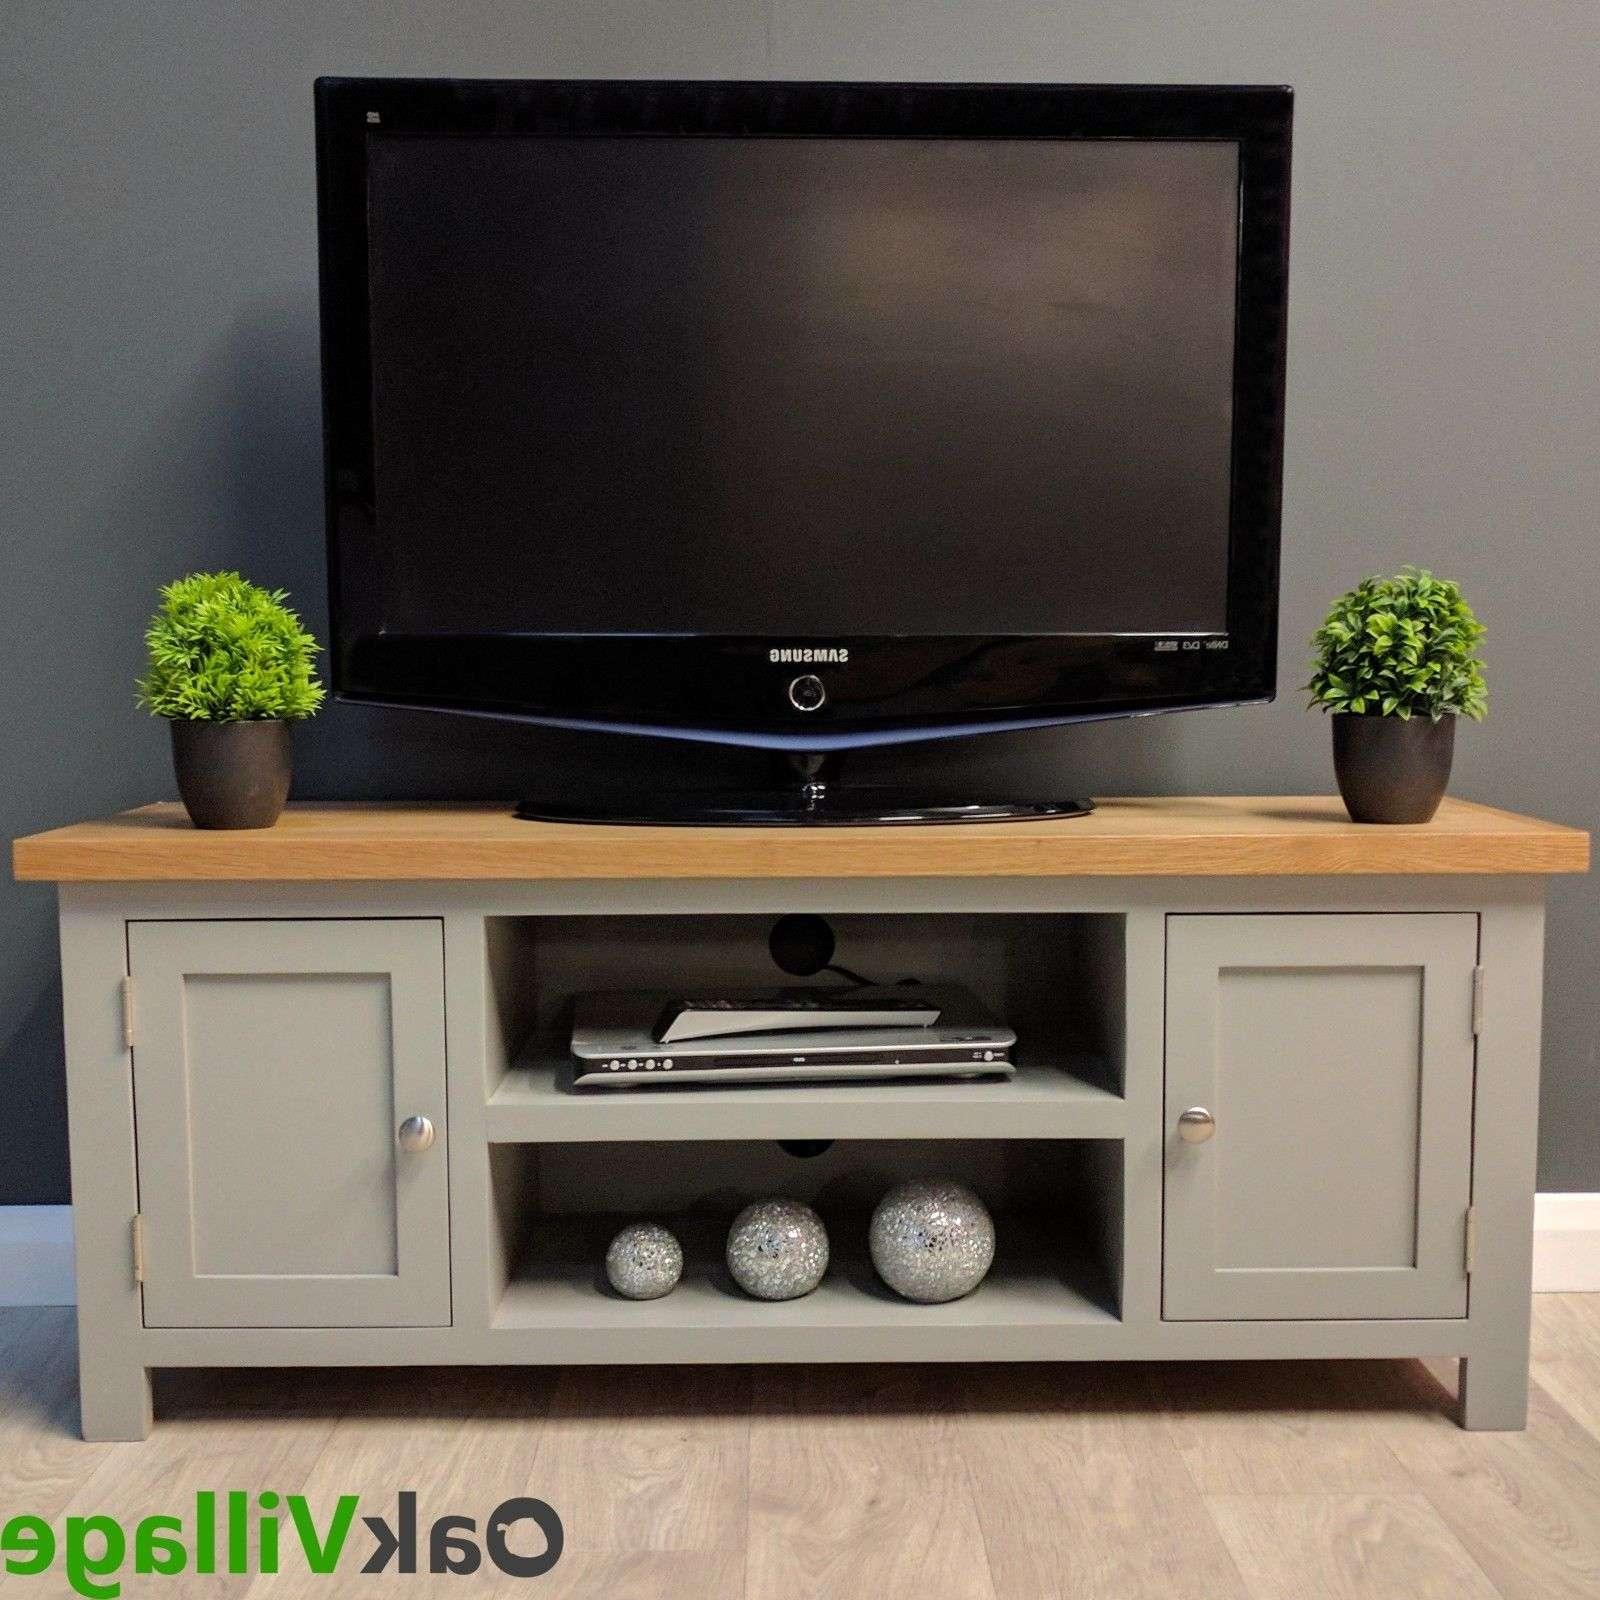 Oak Tv Stands | Ebay With Regard To Tv Stands In Oak (Gallery 15 of 15)